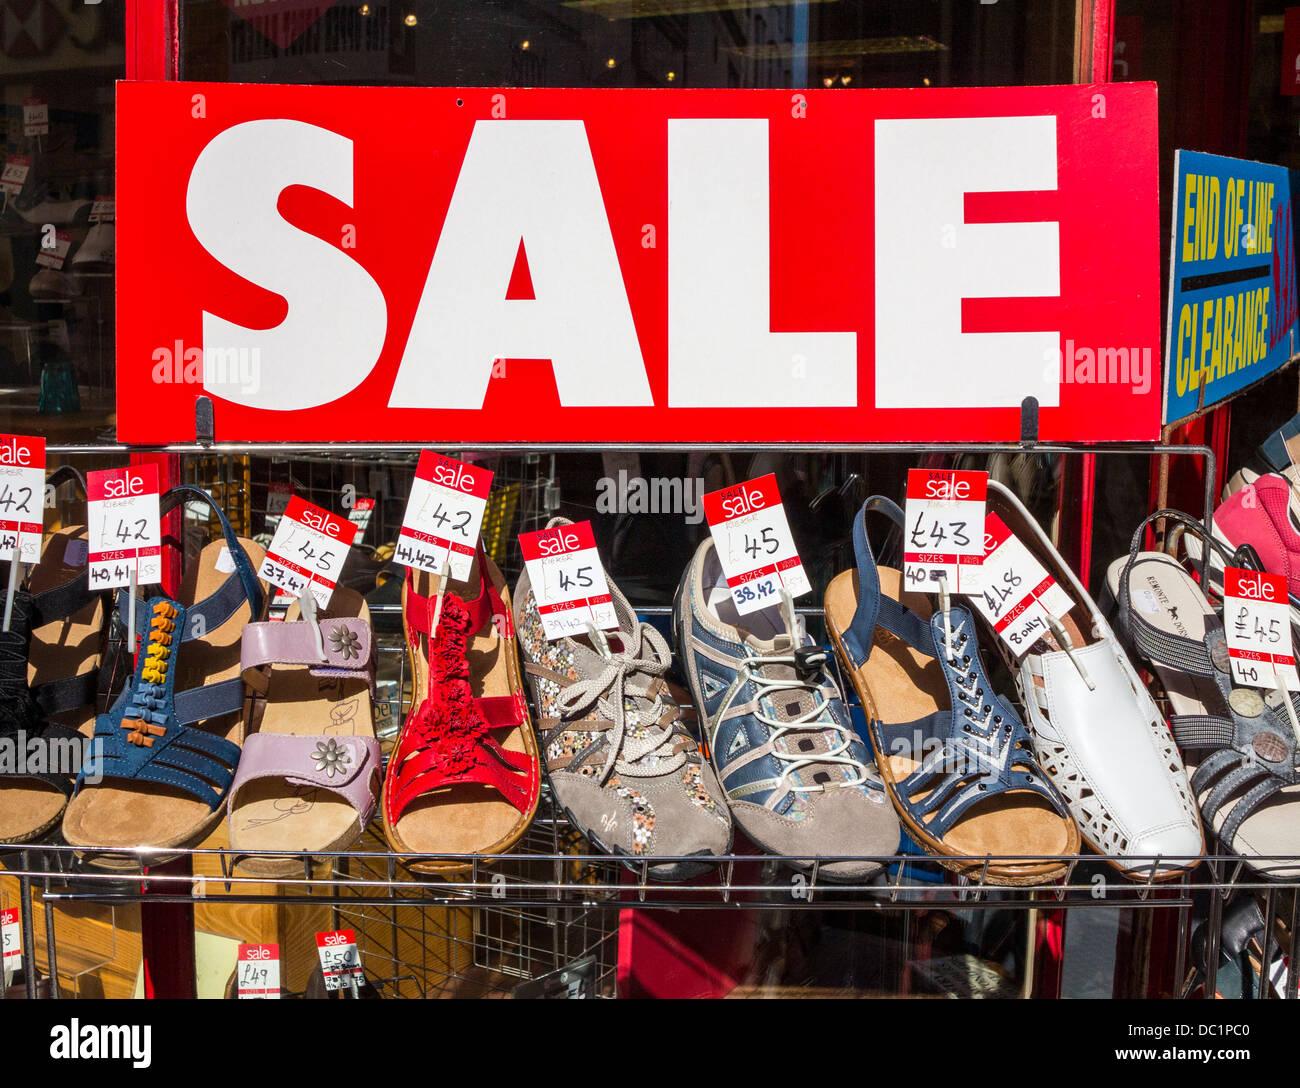 sale sign, Devon, England Stock Photo